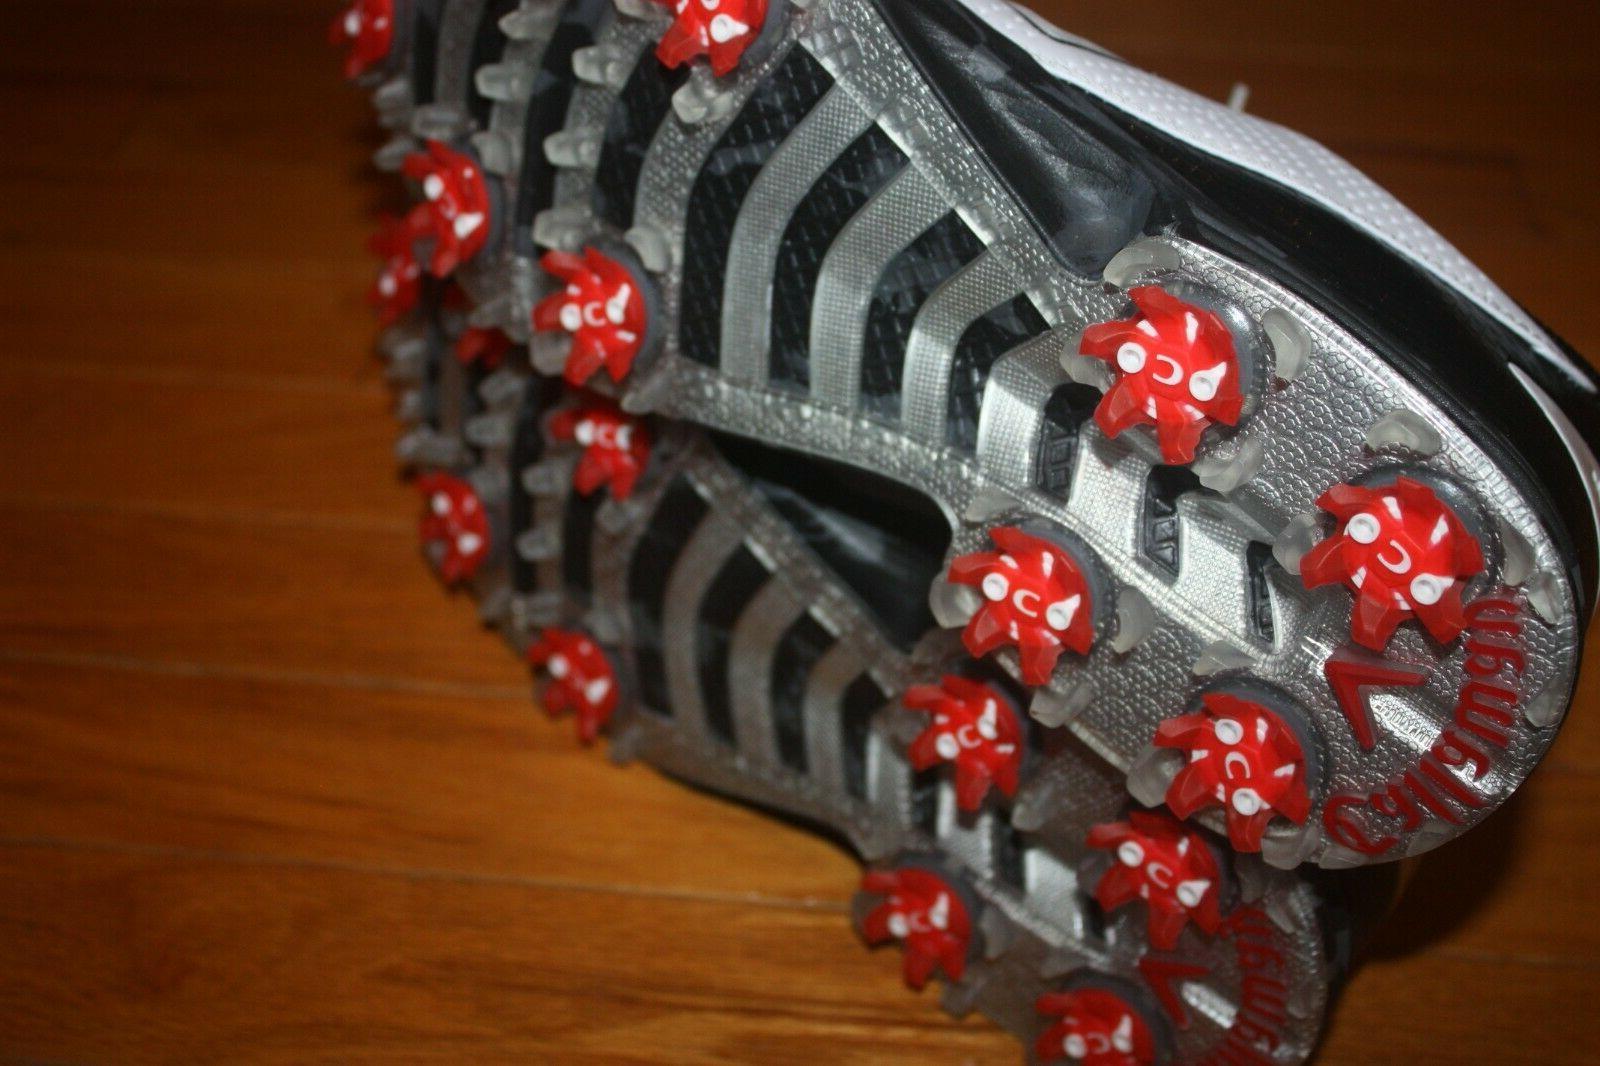 New In Callaway Coronado Shoes FAST